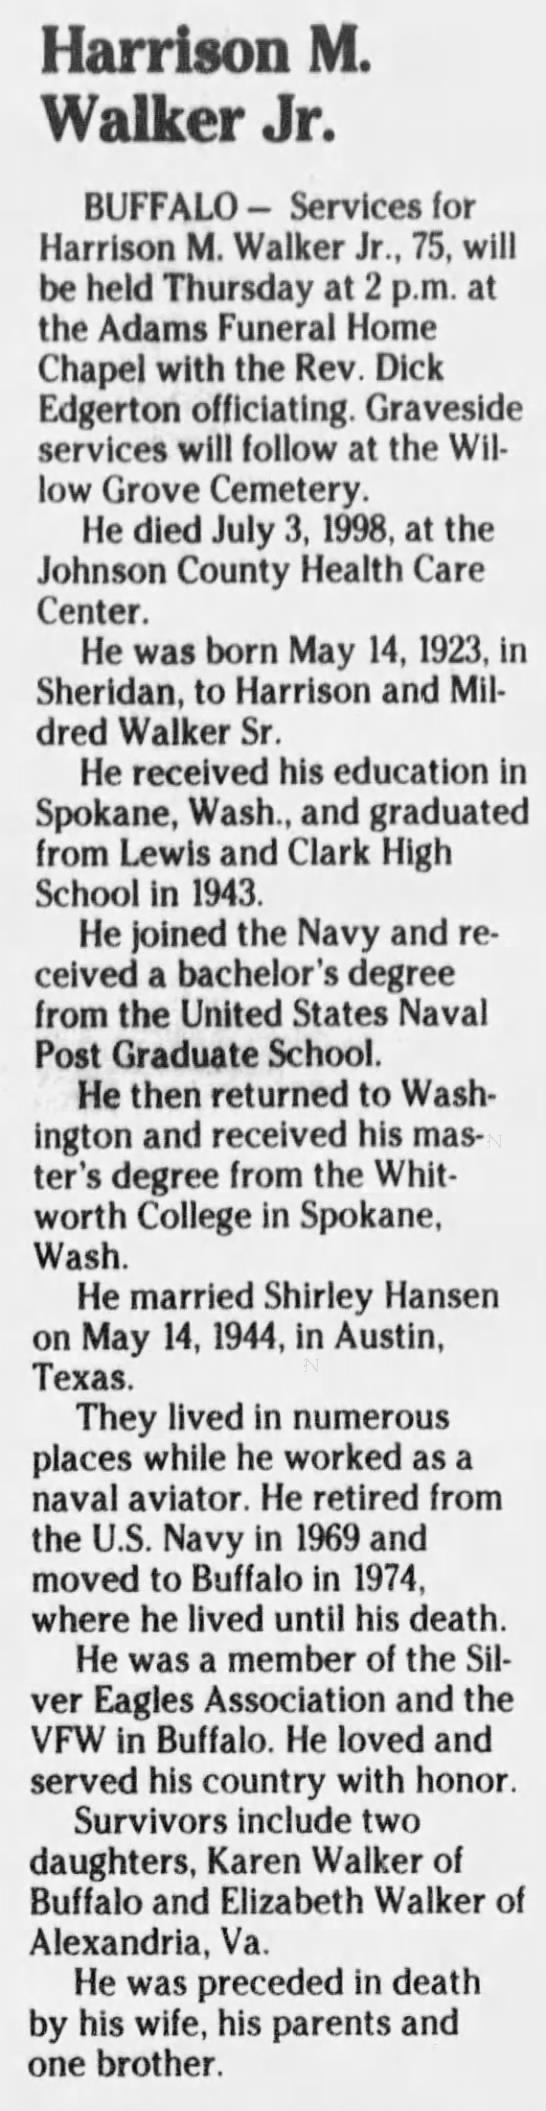 Obituary for Harrison M. Walker, 1923-1998 (Aged 75) -